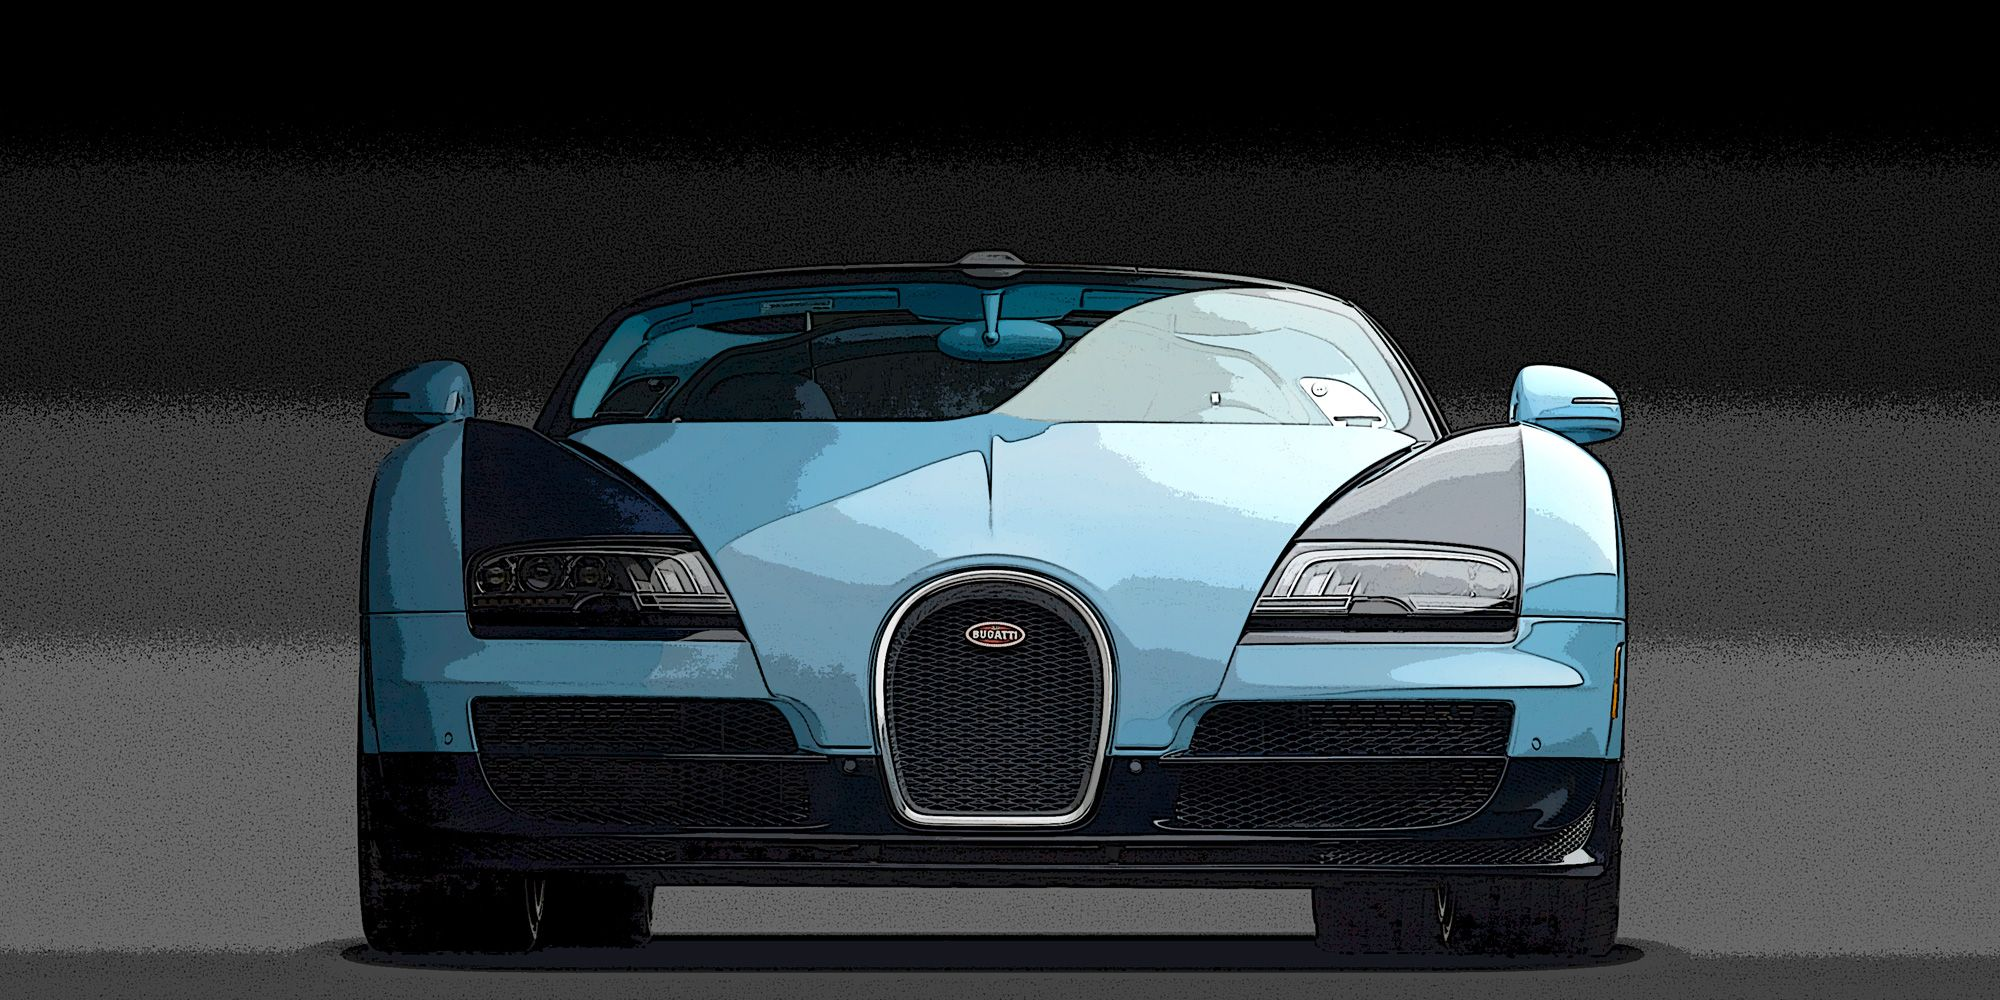 1436555407-roa080115col-nerdy1 Inspiring Bugatti Veyron Price Australian Dollars Cars Trend